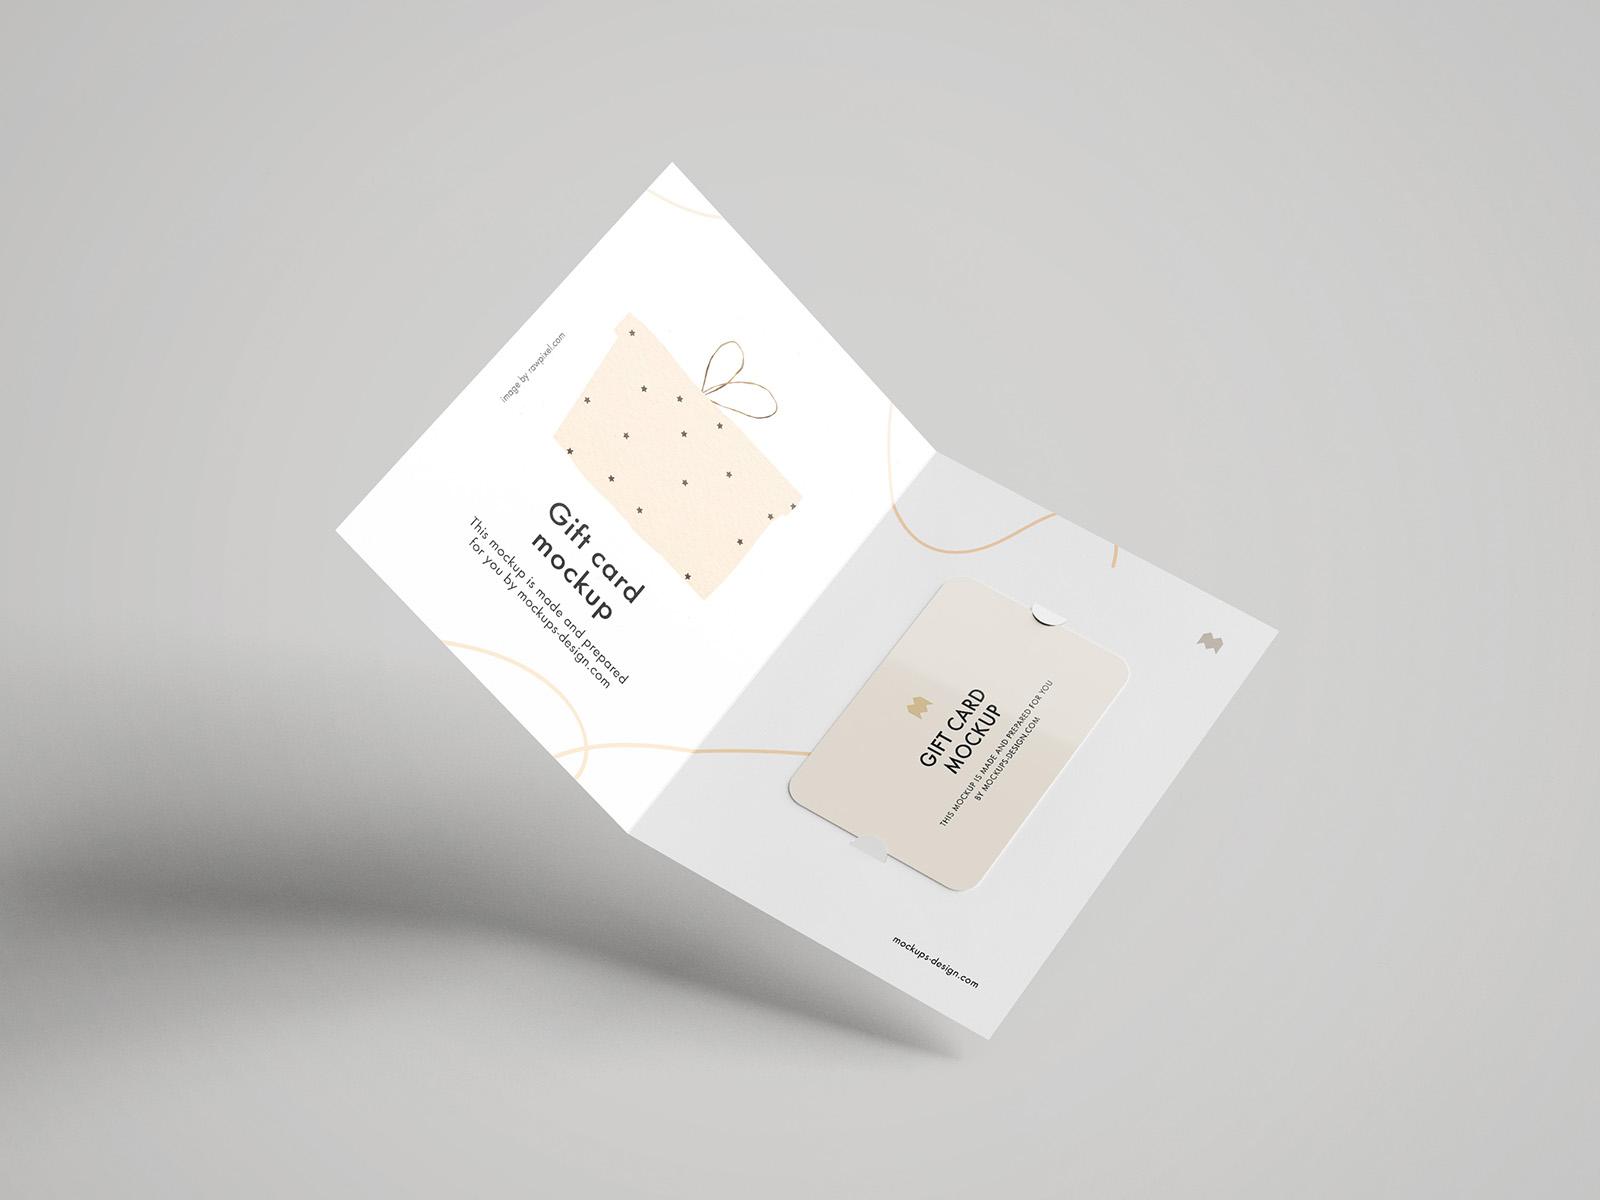 Free gift card mockup